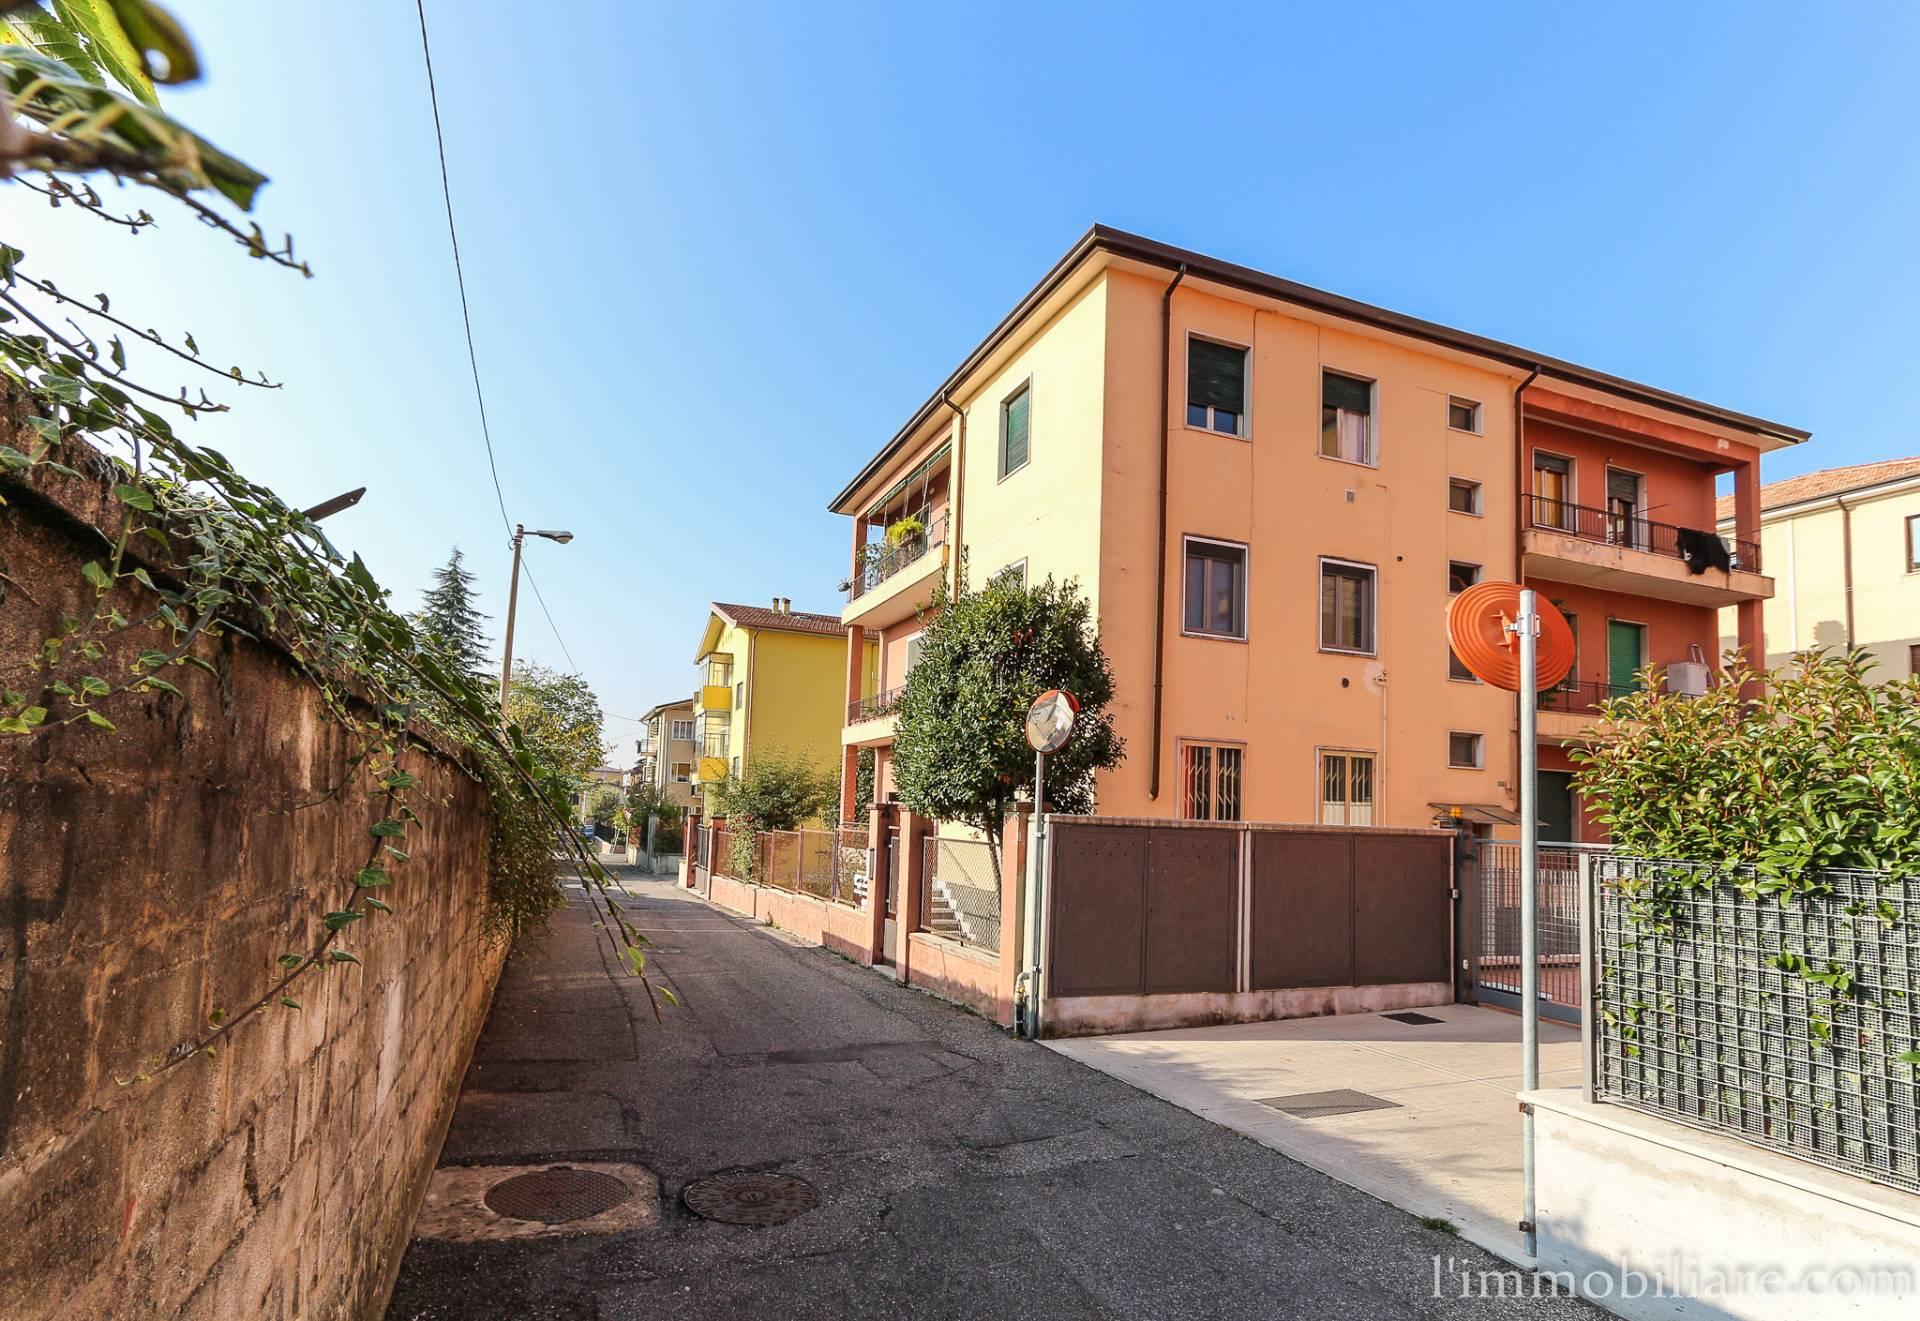 Appartamento, 102 Mq, Vendita - Verona (Verona)